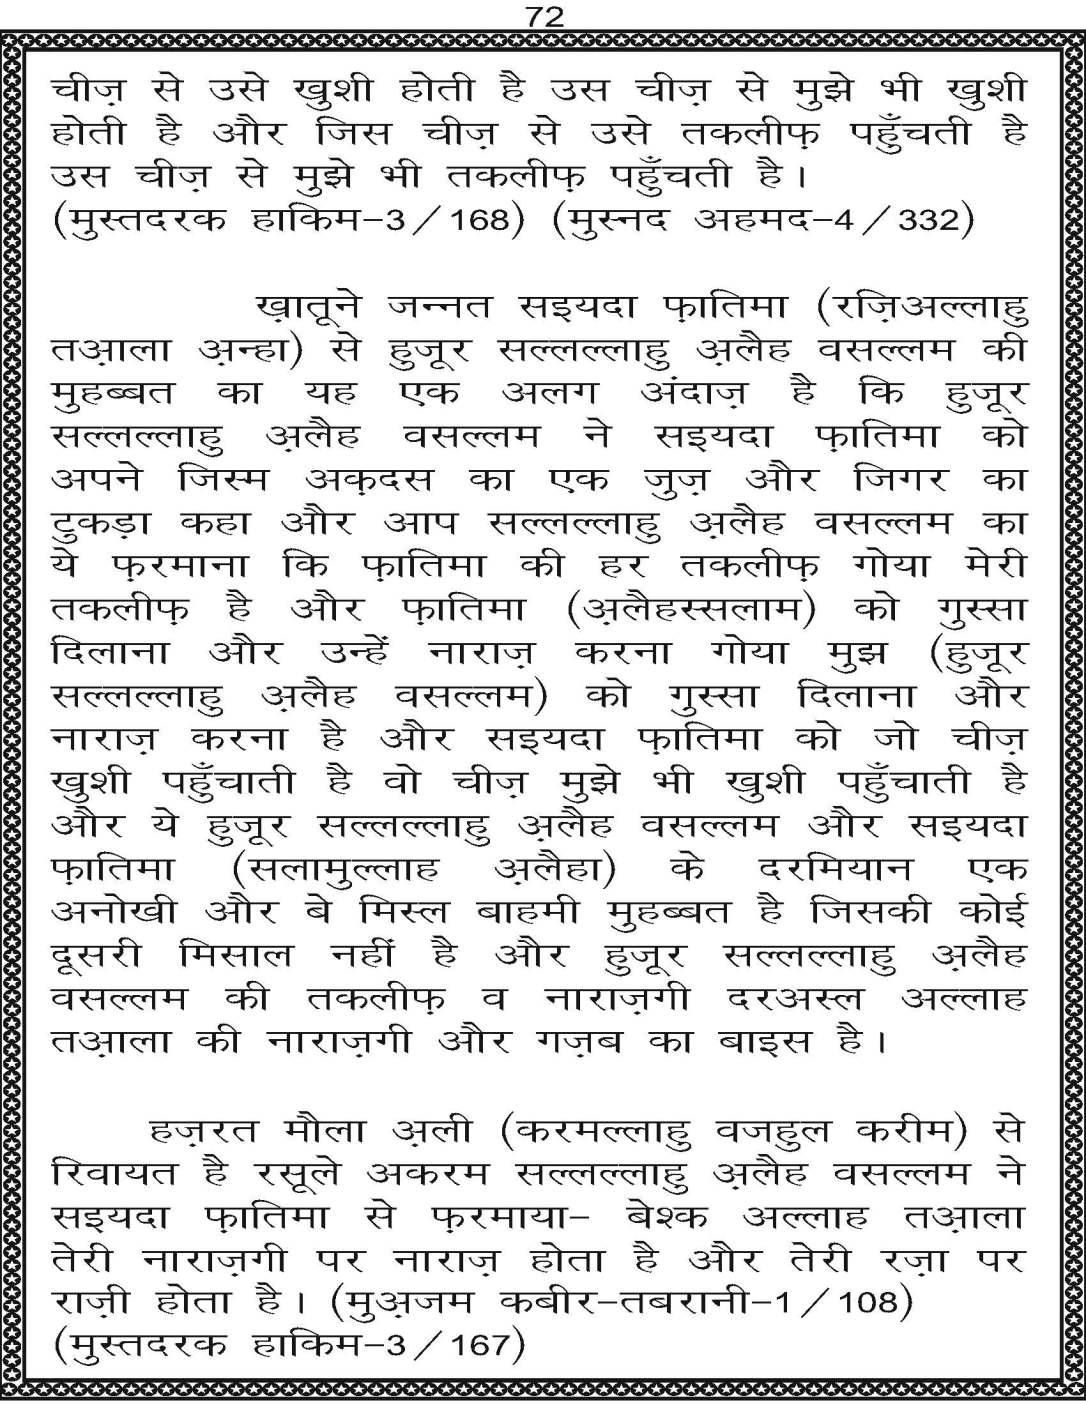 AzmateTaziyadari_Page_072